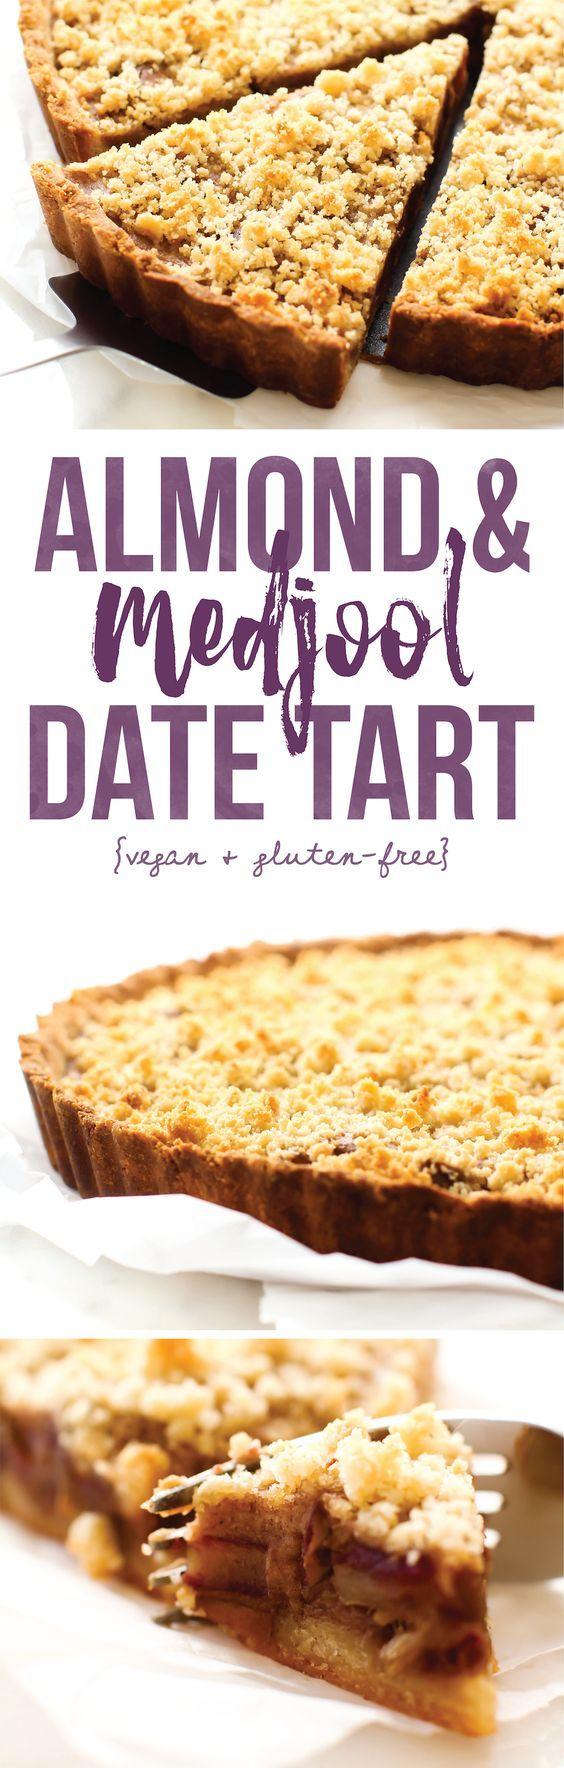 Almond & Medjool Date Tart {vegan, gluten-free, oil-free}